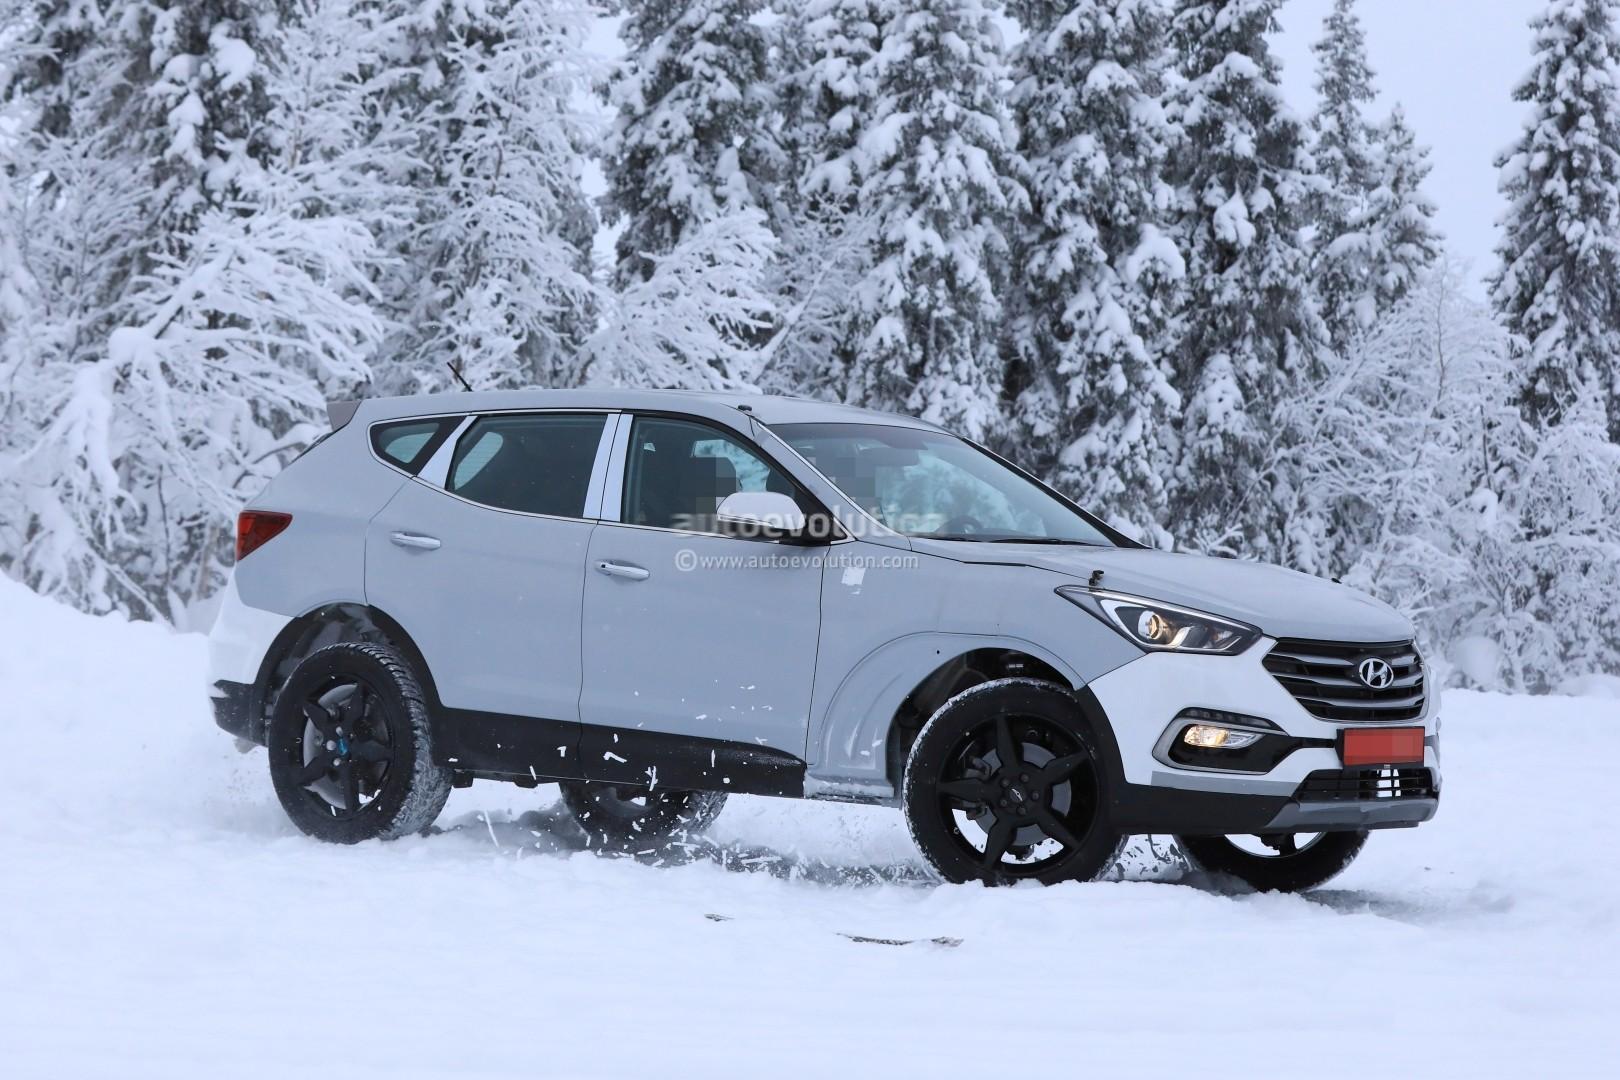 2020 Genesis GV80 SUV Full Review >> 2020 Genesis GV80 SUV Full Review | 2020 Upcoming Car Release